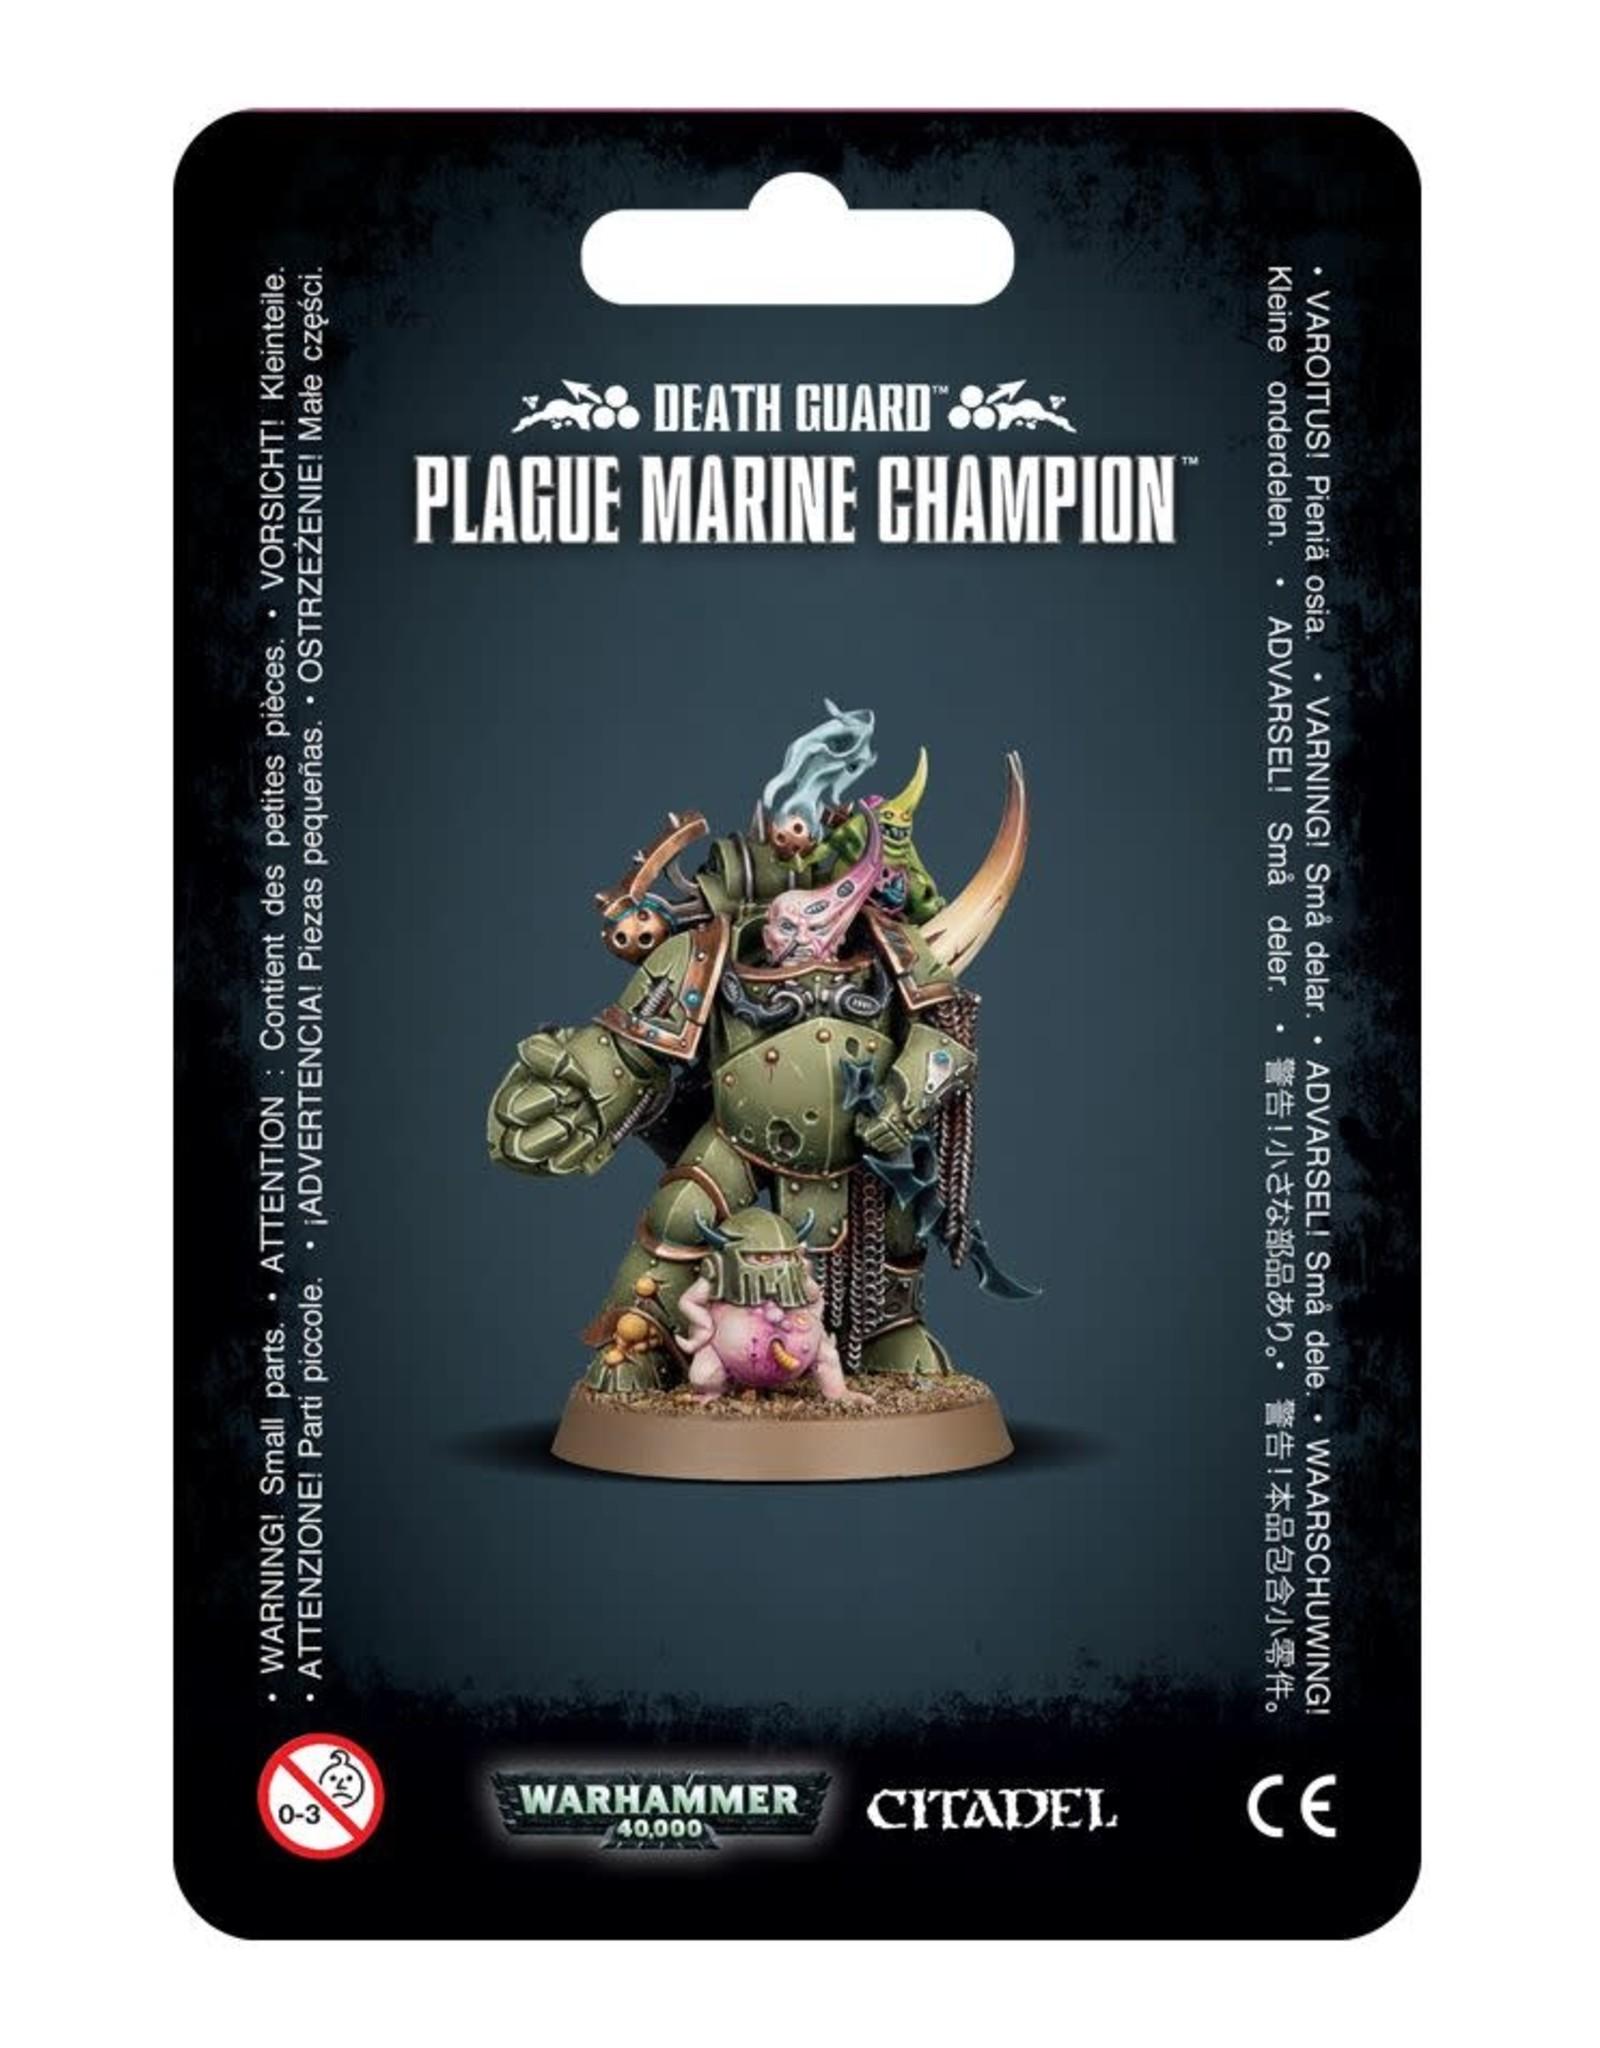 Warhammer 40K Death Guard Plague Marine Champion